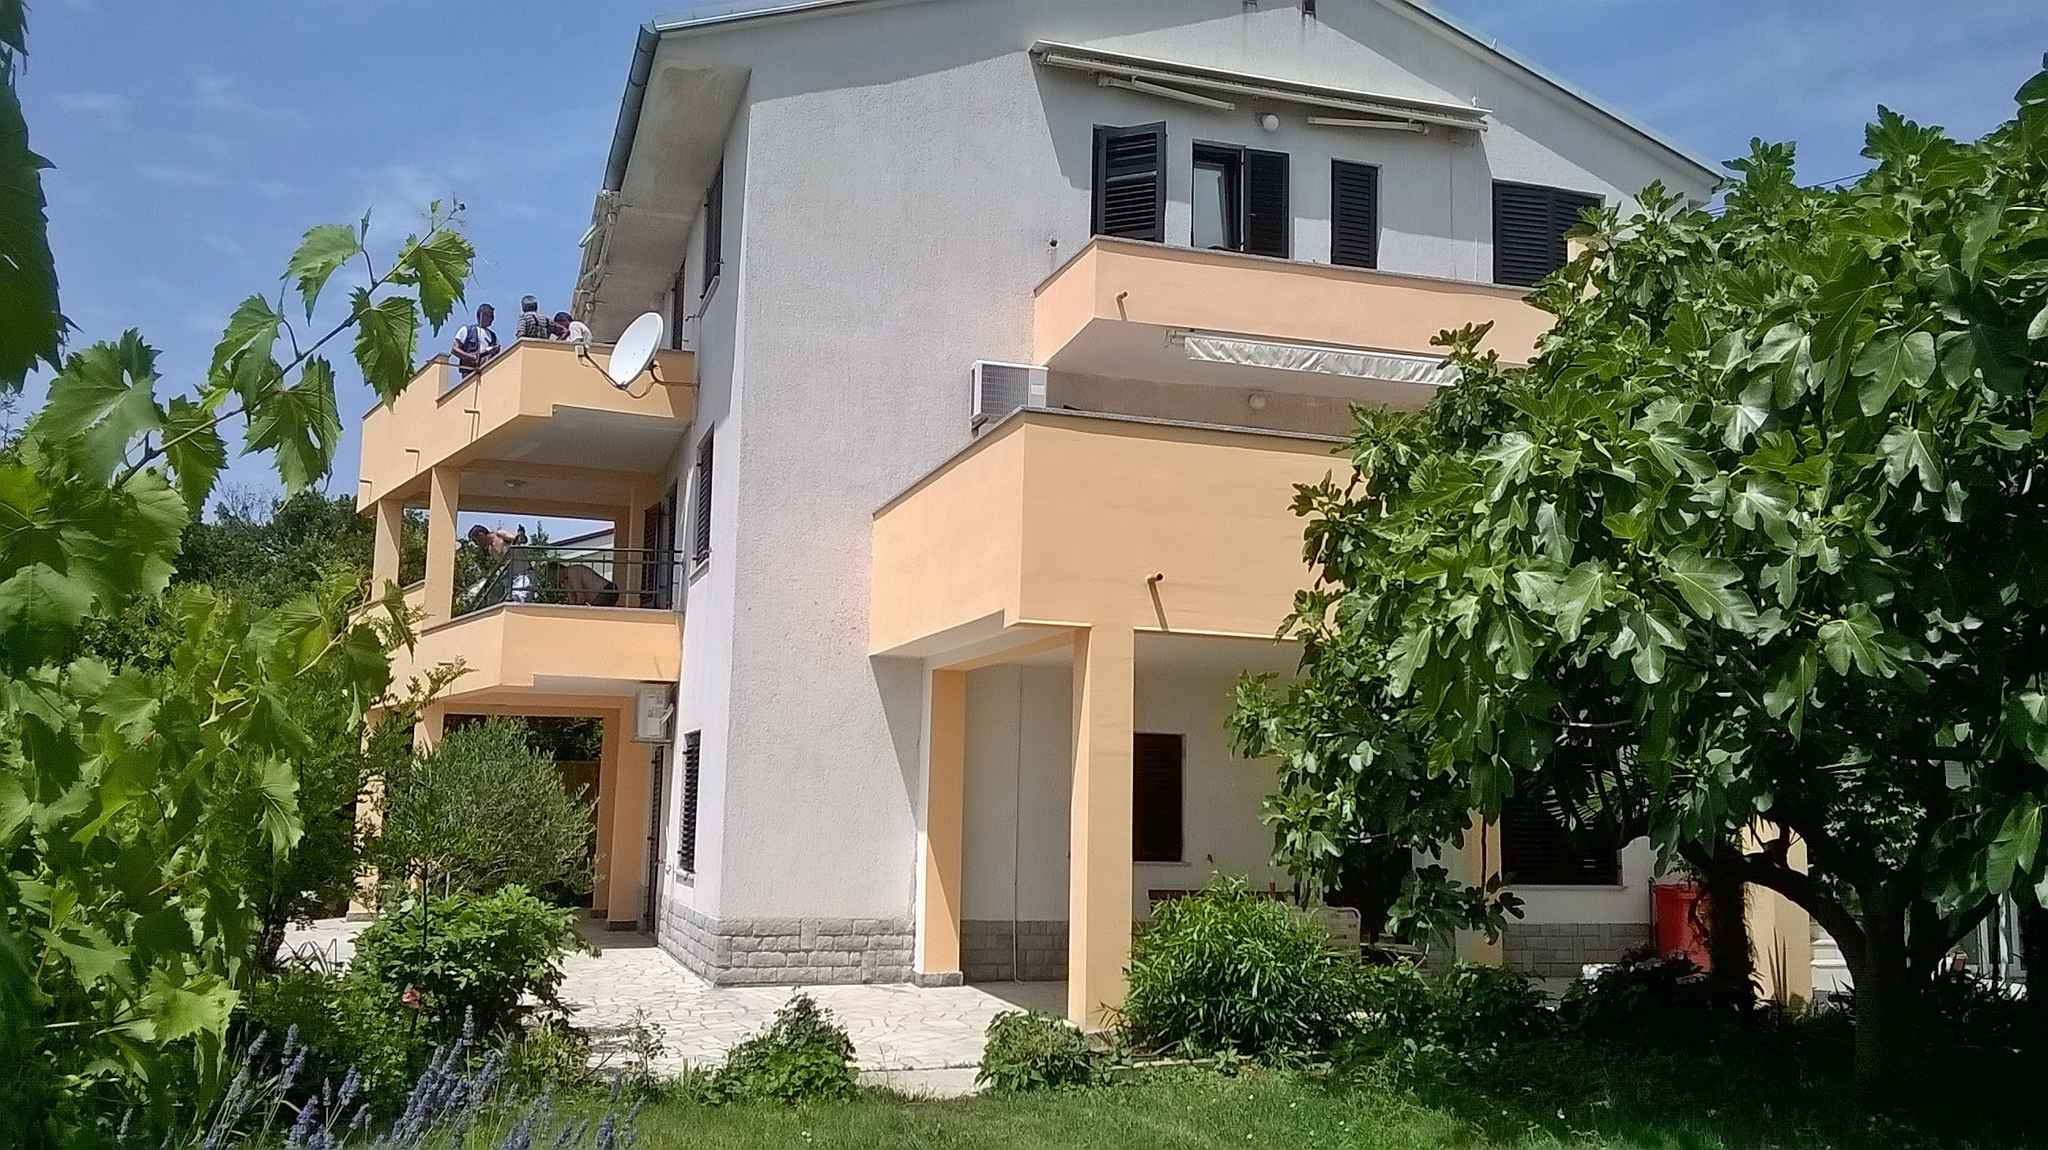 Appartement de vacances nahe von Meer, WI-FI, Klima (2182509), Novi Vinodolski, , Kvarner, Croatie, image 6